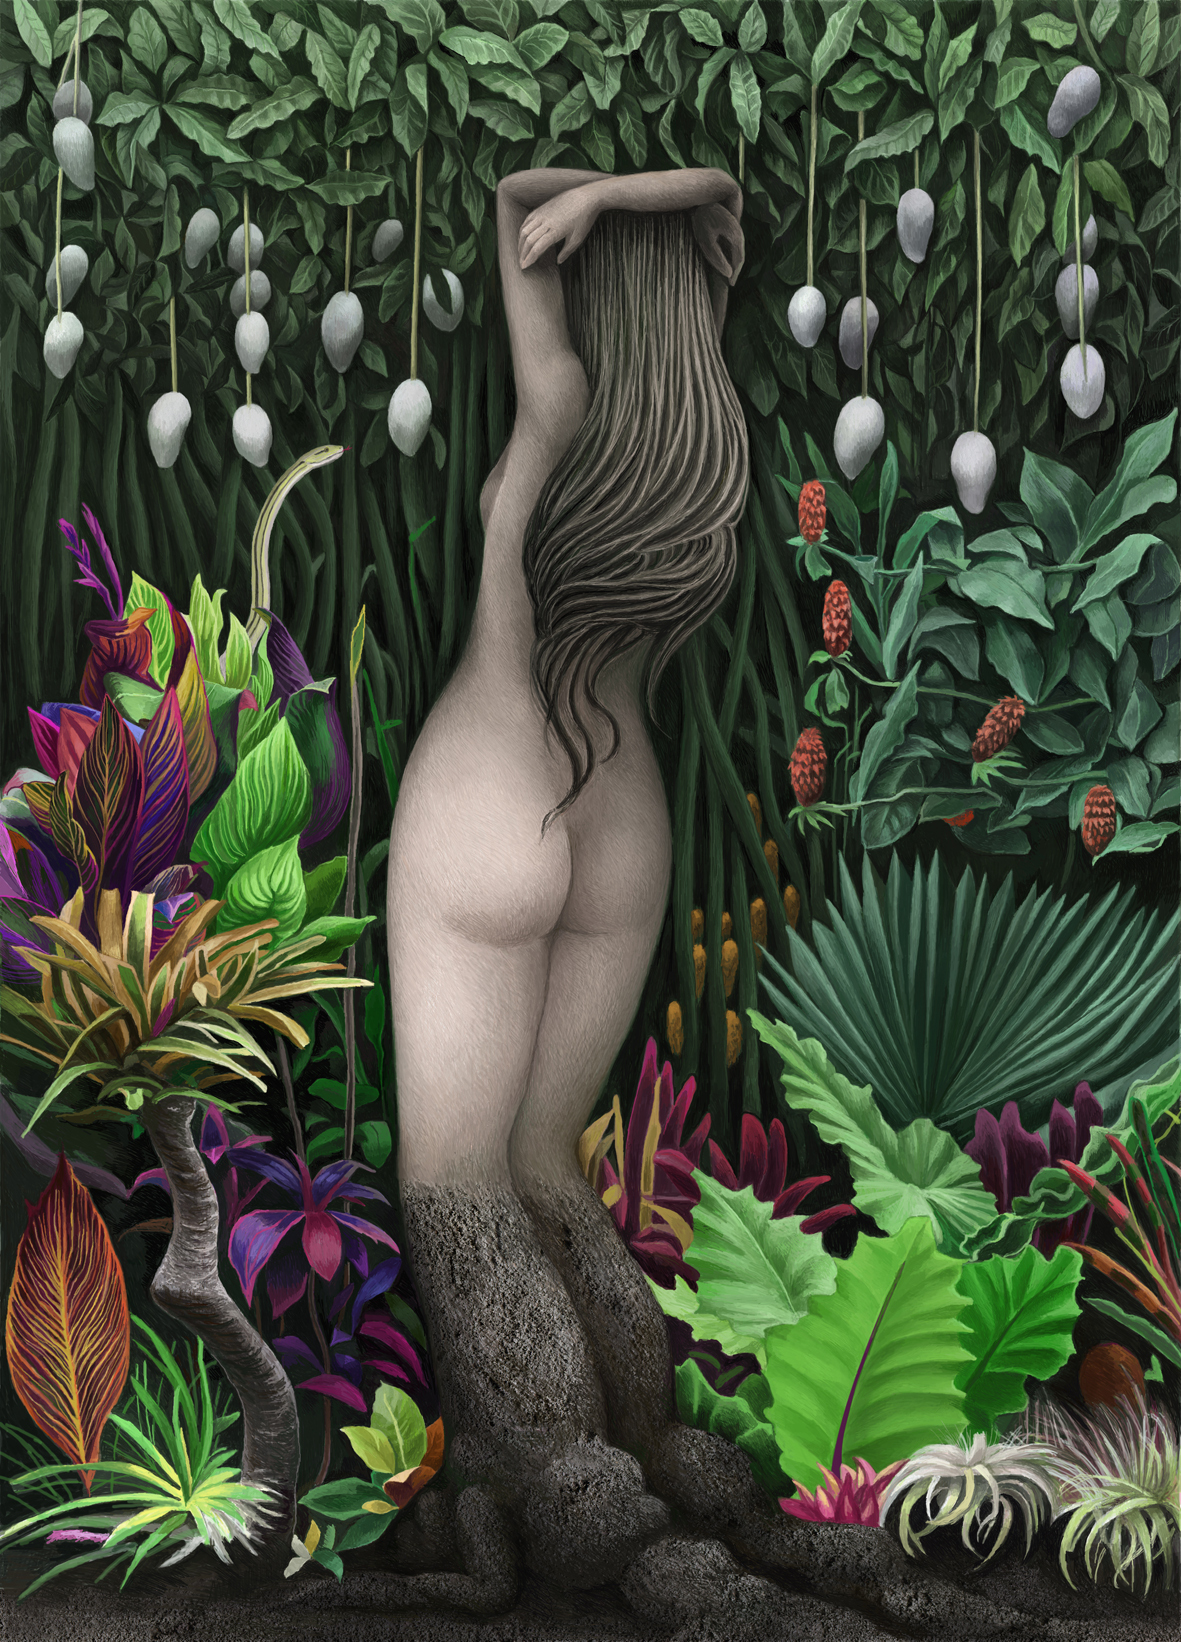 Tropical lady